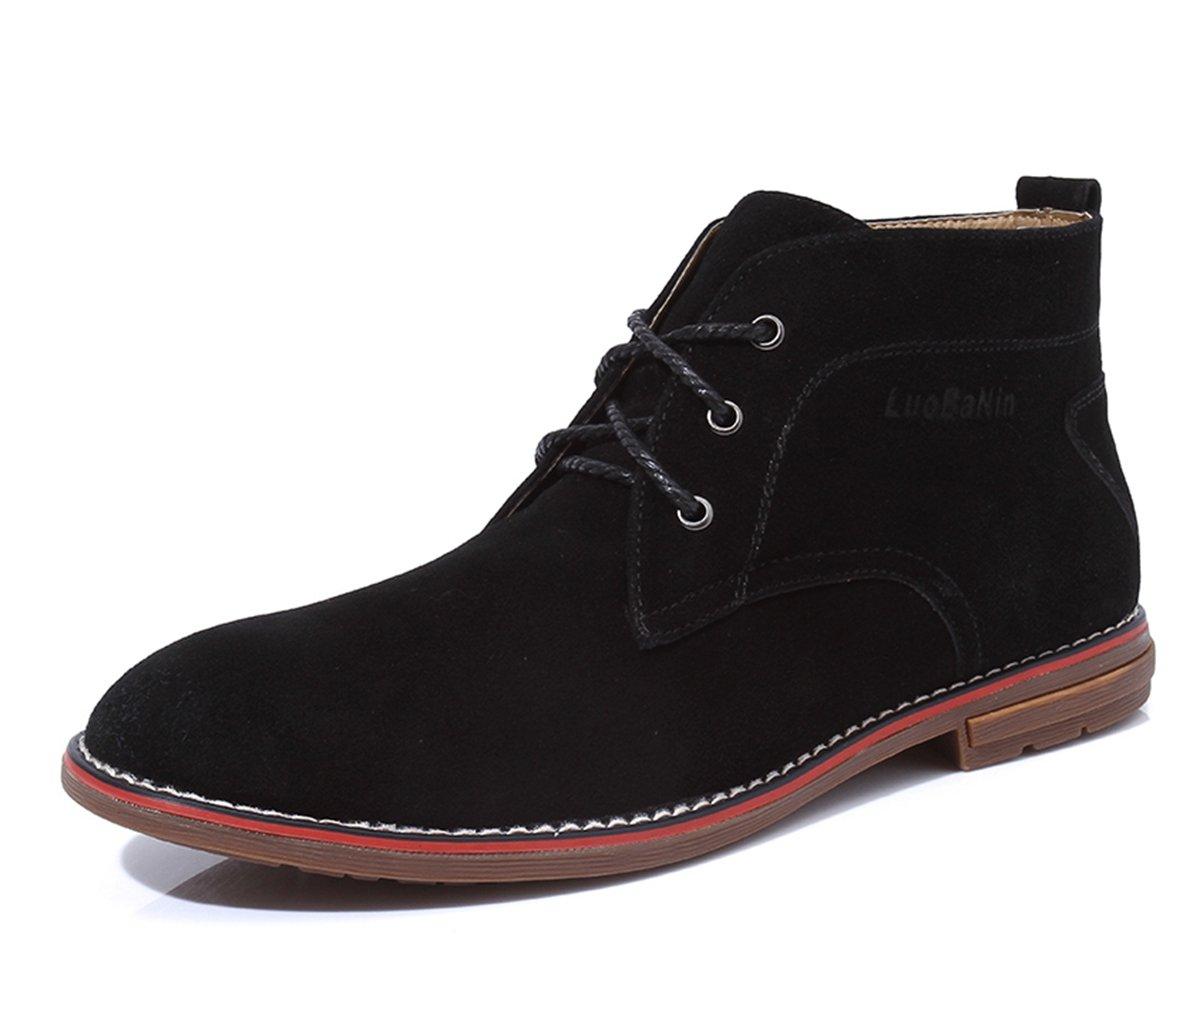 Minishion Men's Classic Original Black Suede Basic Chukka Ankle Boots US 10.5